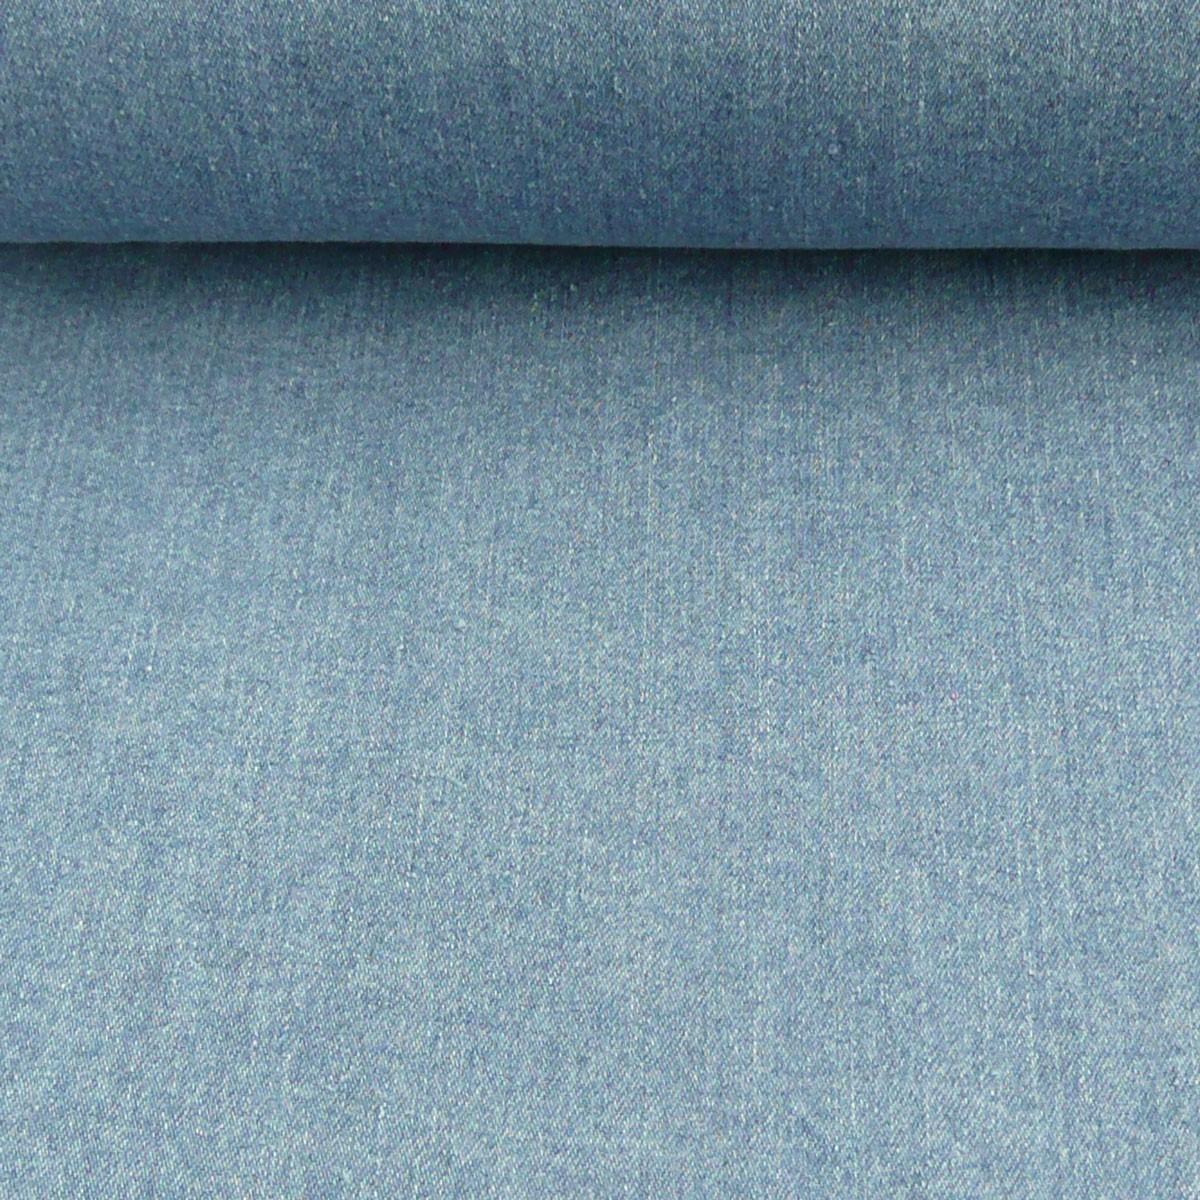 Jeansstoff Stoff Stretch Jeans hellblau 9OZ